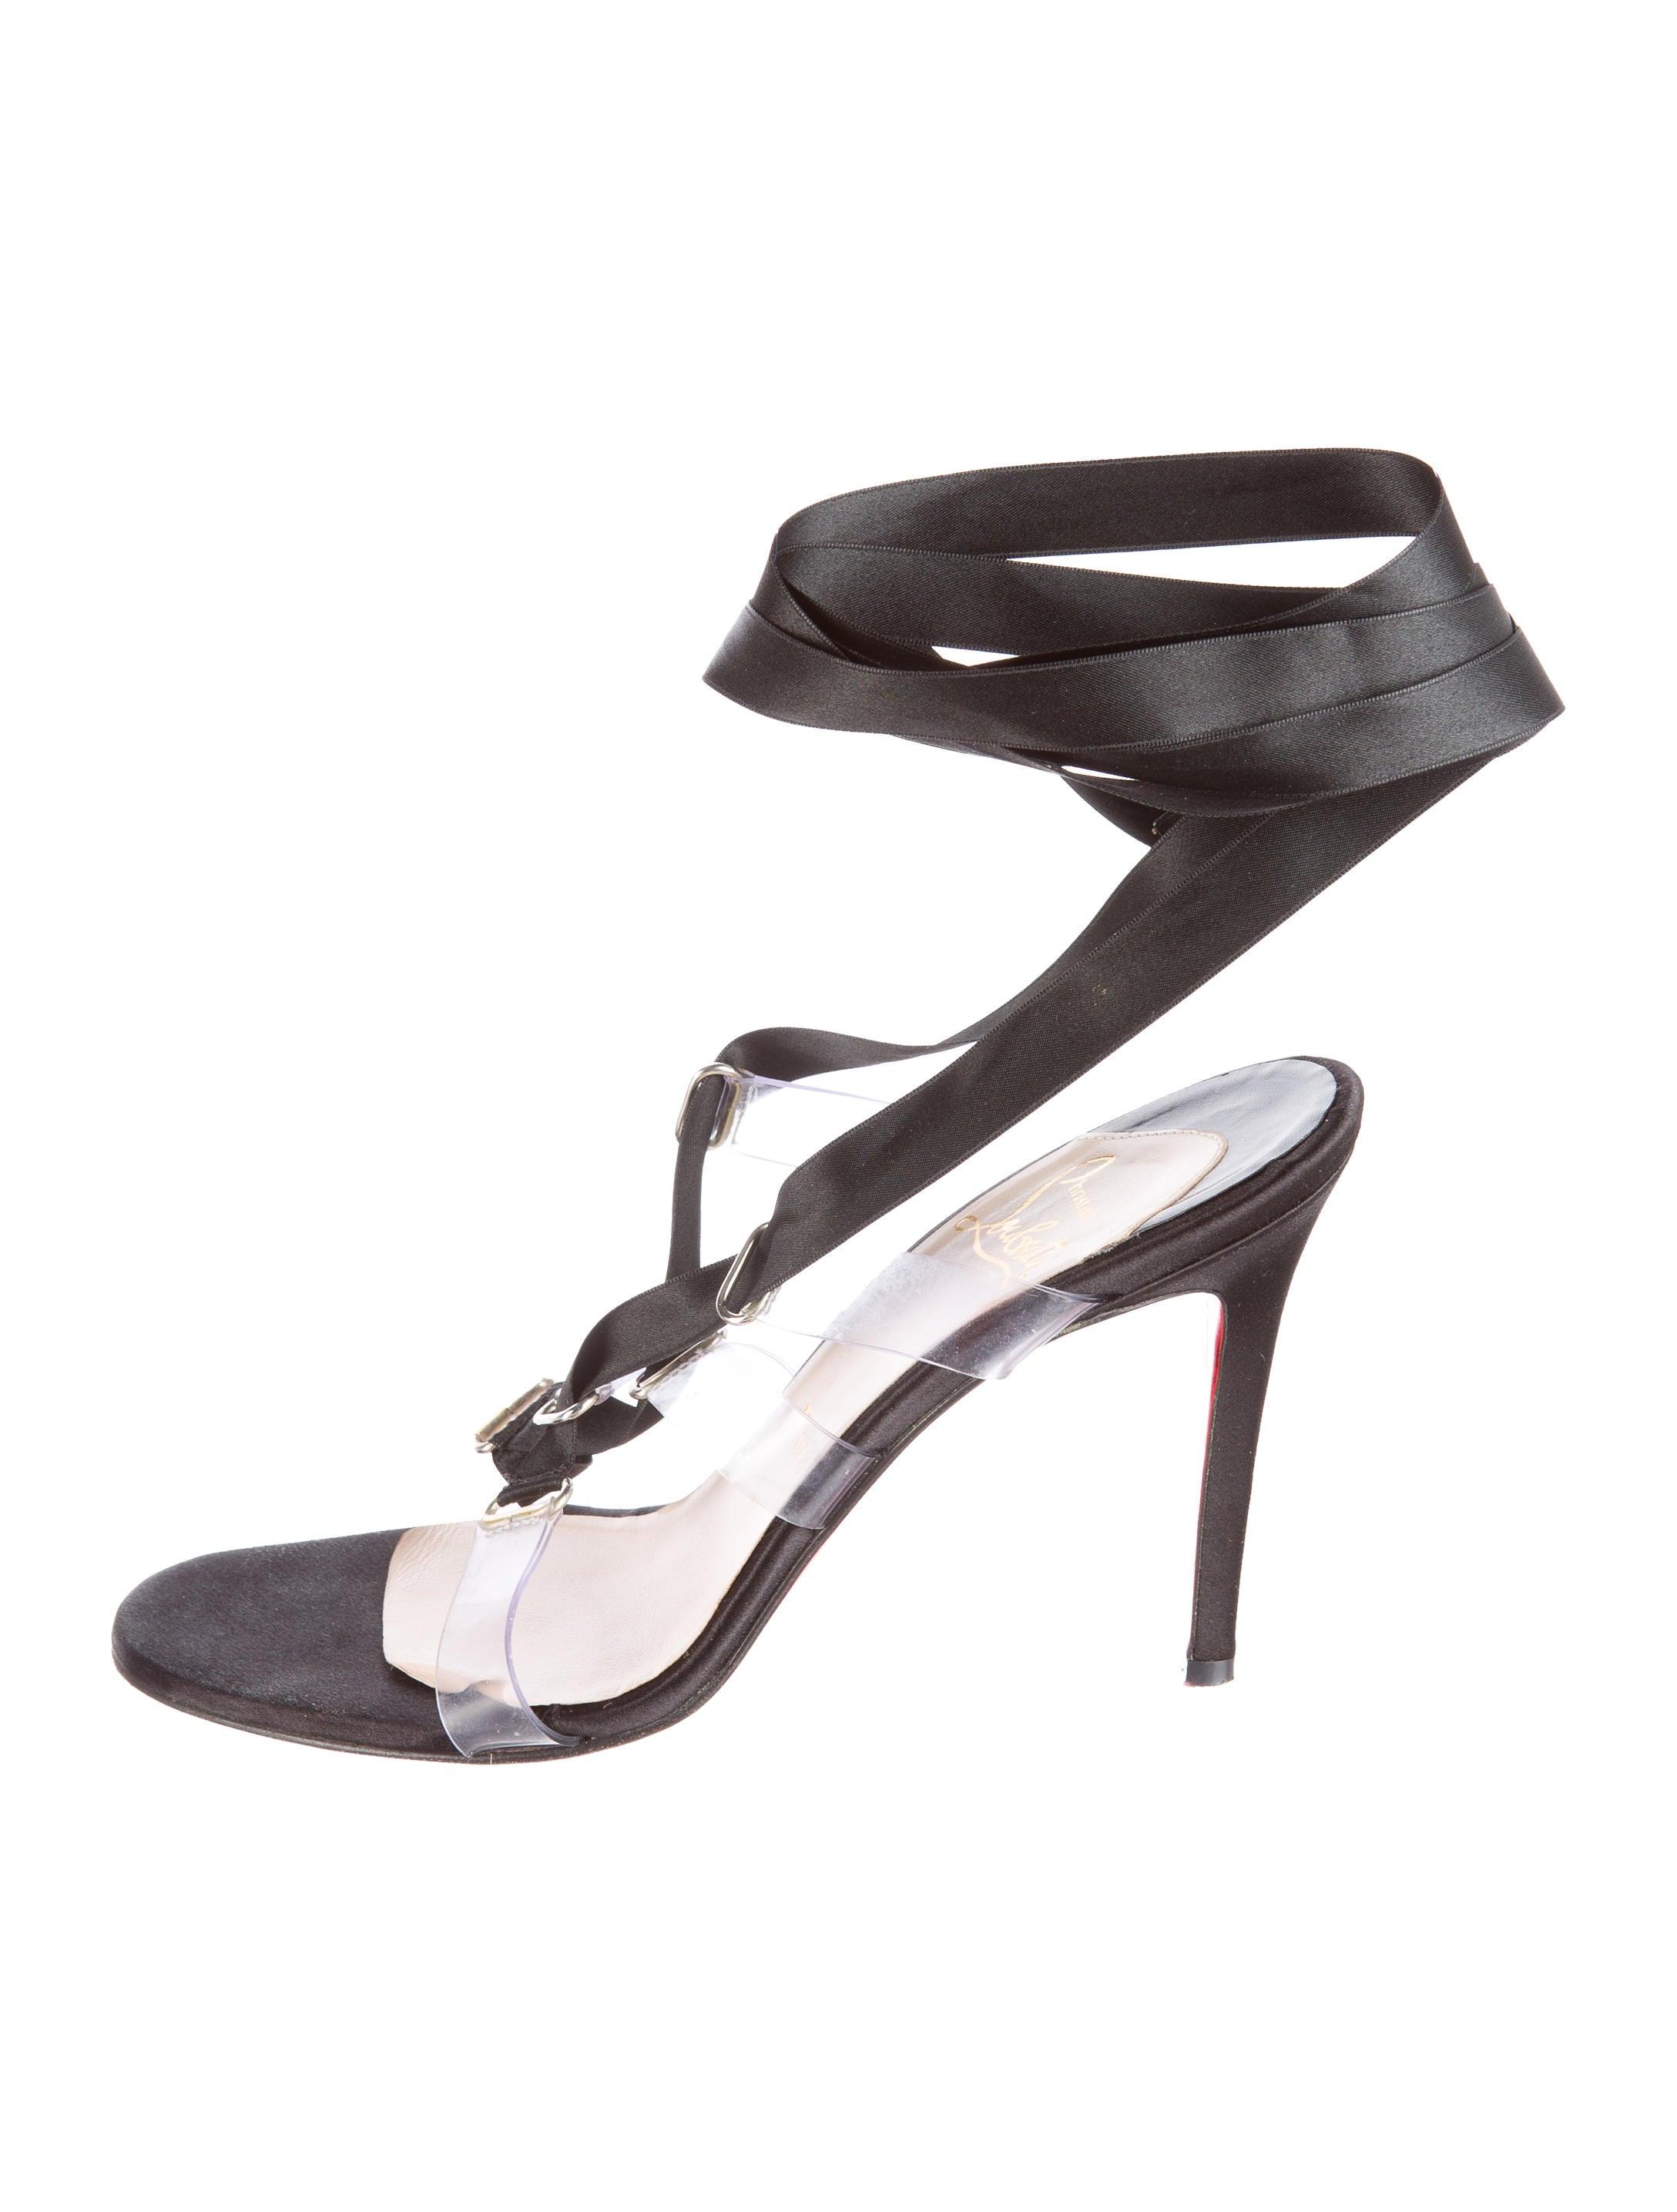 e58f7dba8c4 Nymphette Ribbon Lace-Up Sandals